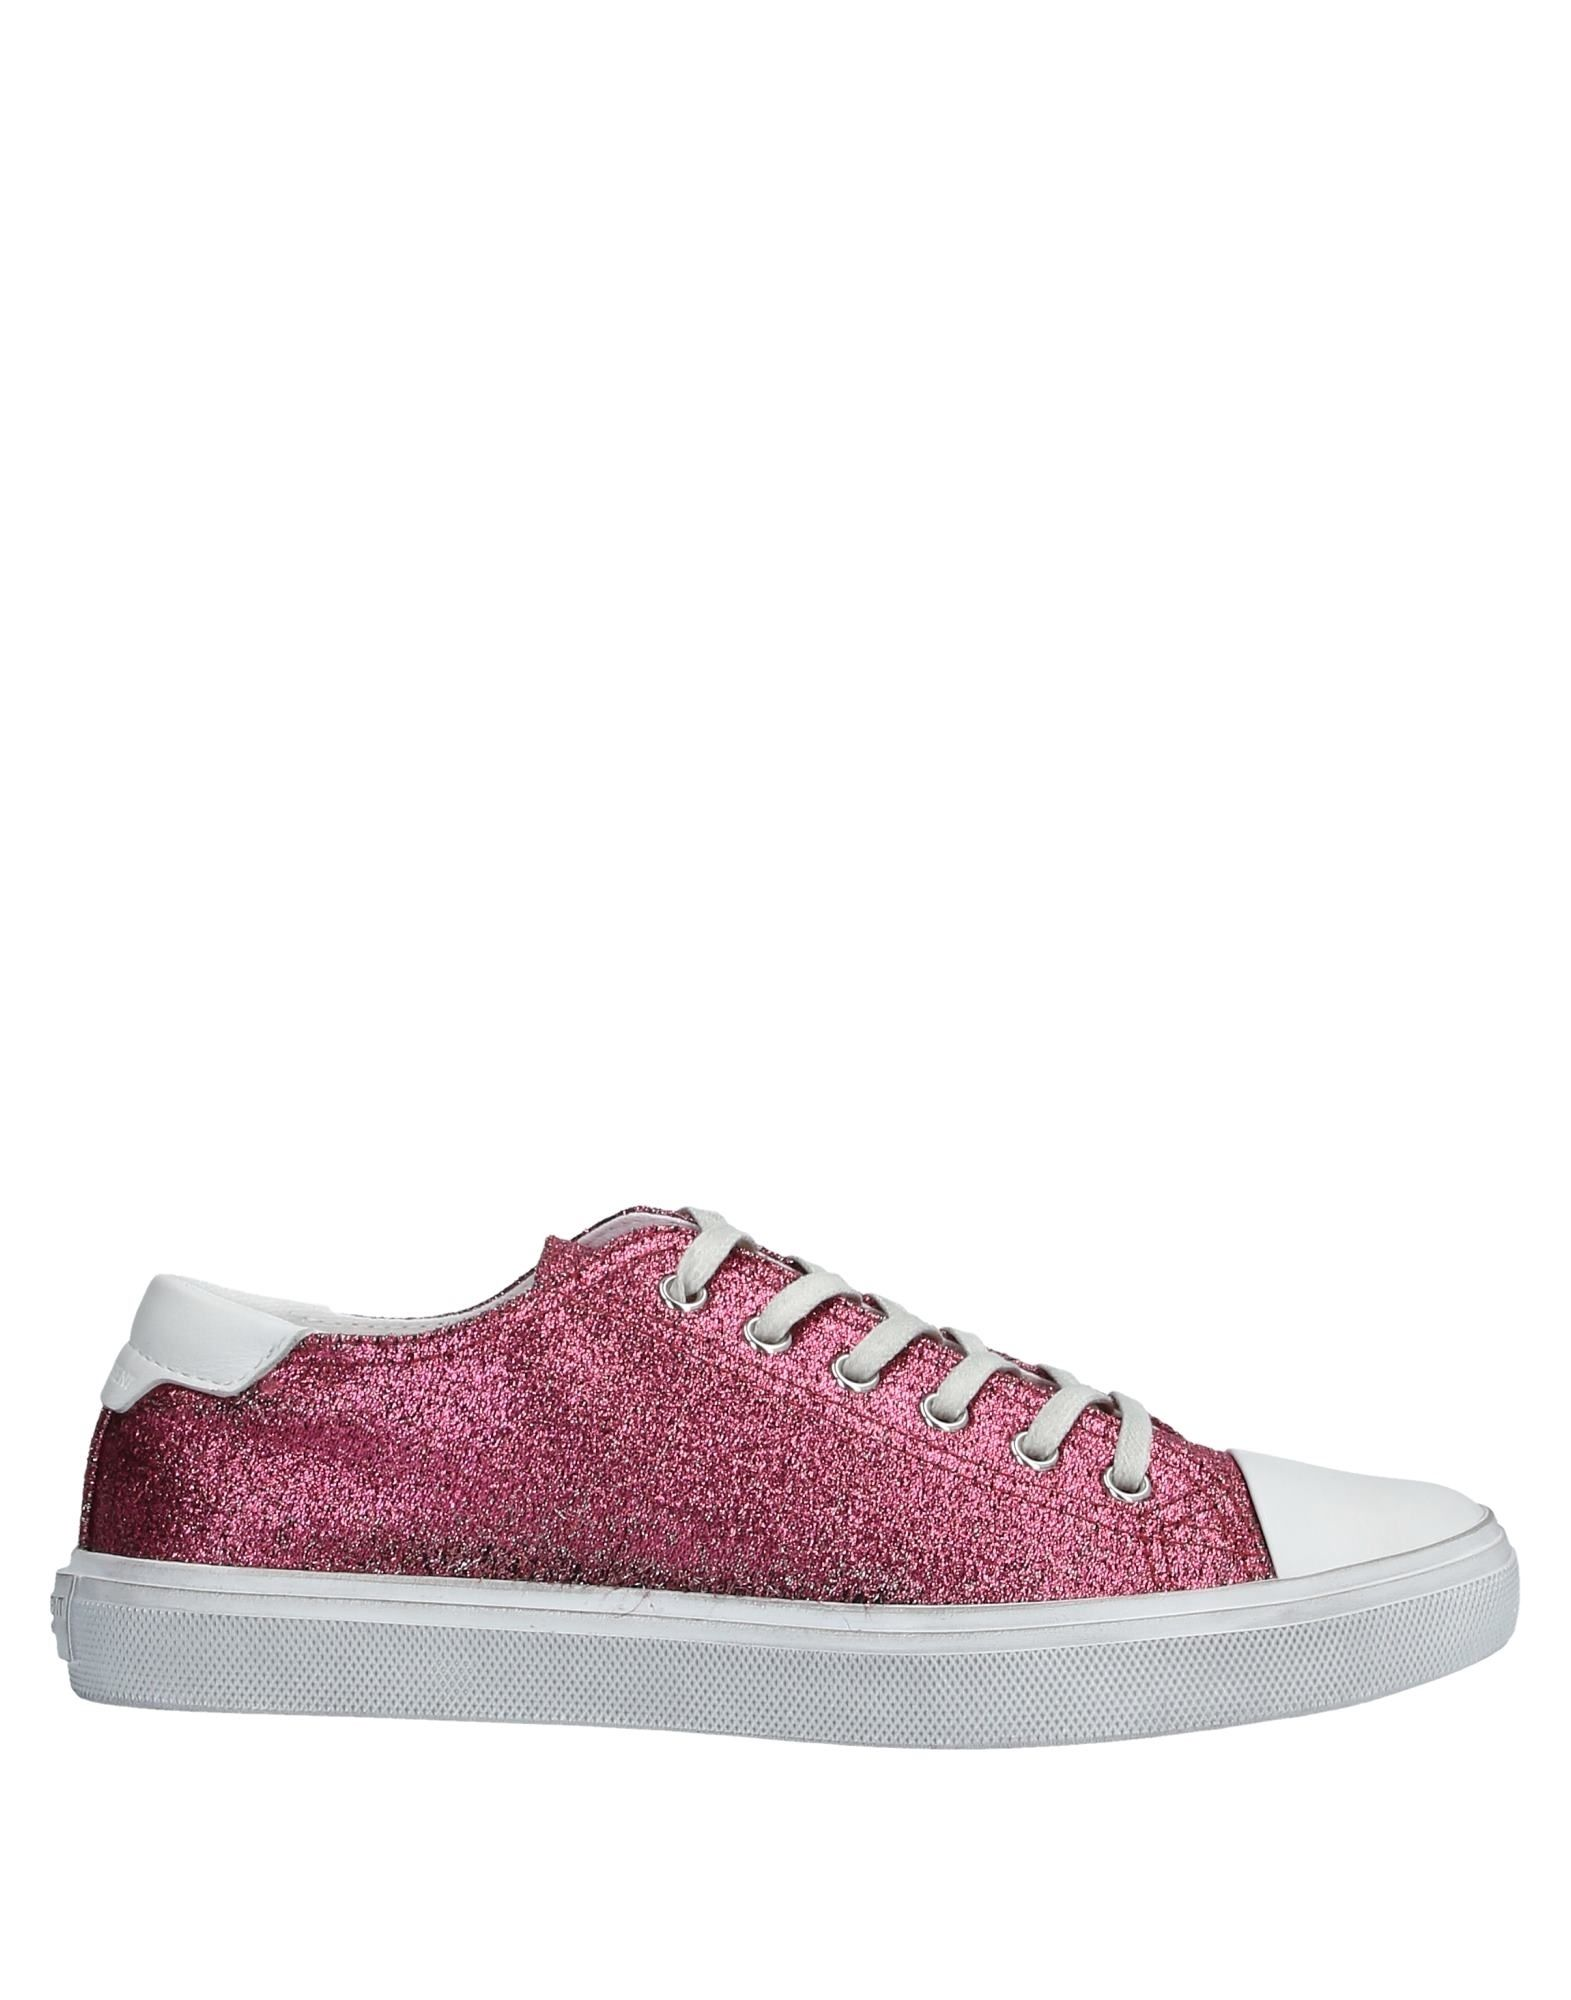 SAINT LAURENT Low-tops & sneakers - Item 11790890